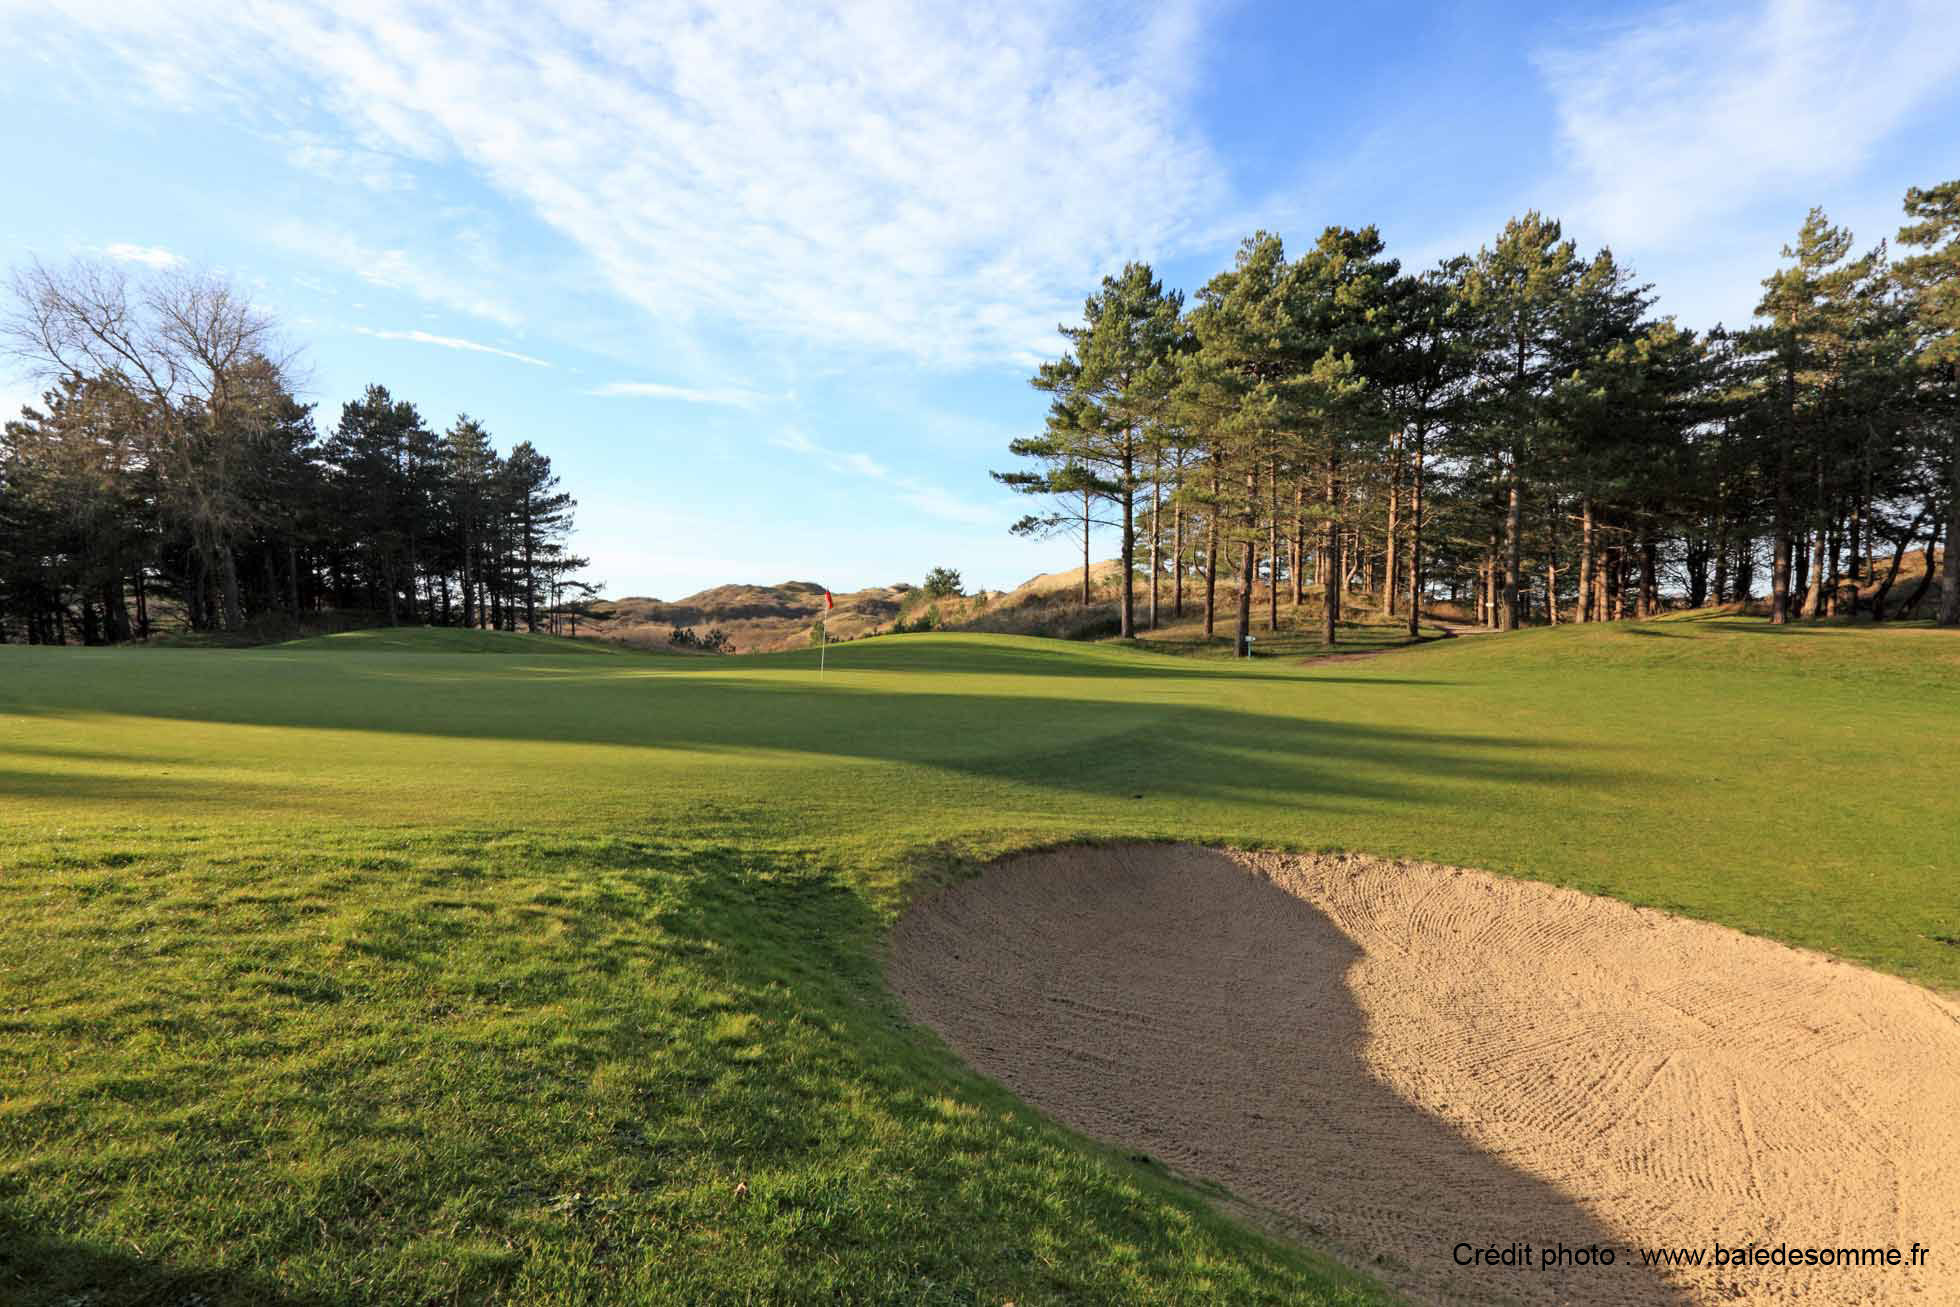 http://alachaumiere.com/wp-content/uploads/2016/08/Golf-de-Belle-Dune-.jpg